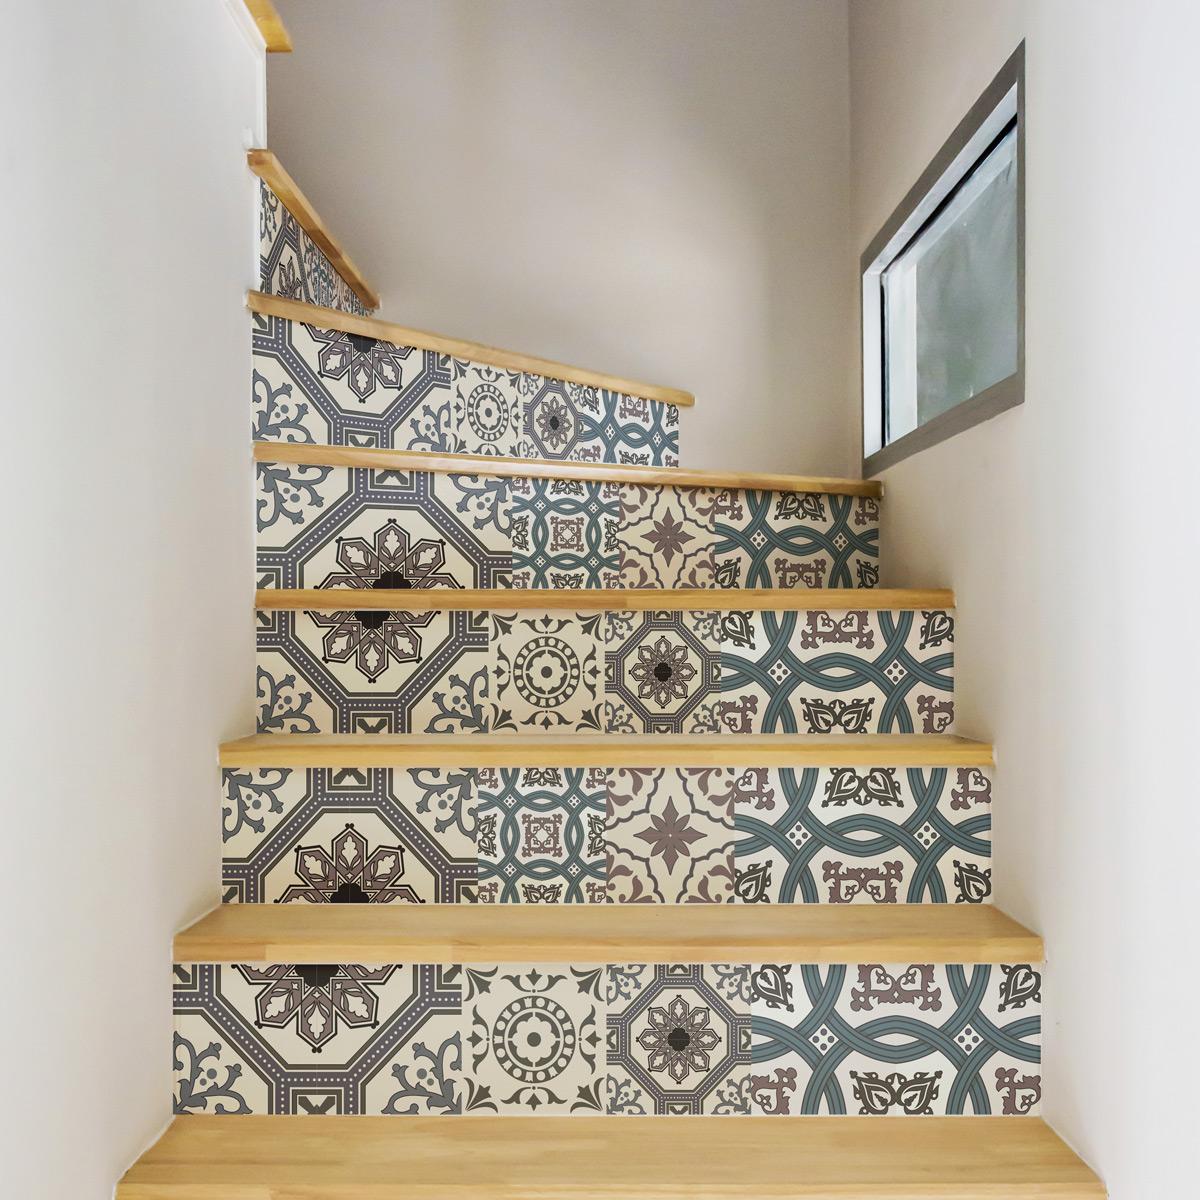 stickers contremarche carrelages ignozio x 2 stickers carrelage stickers carrelage escalier. Black Bedroom Furniture Sets. Home Design Ideas